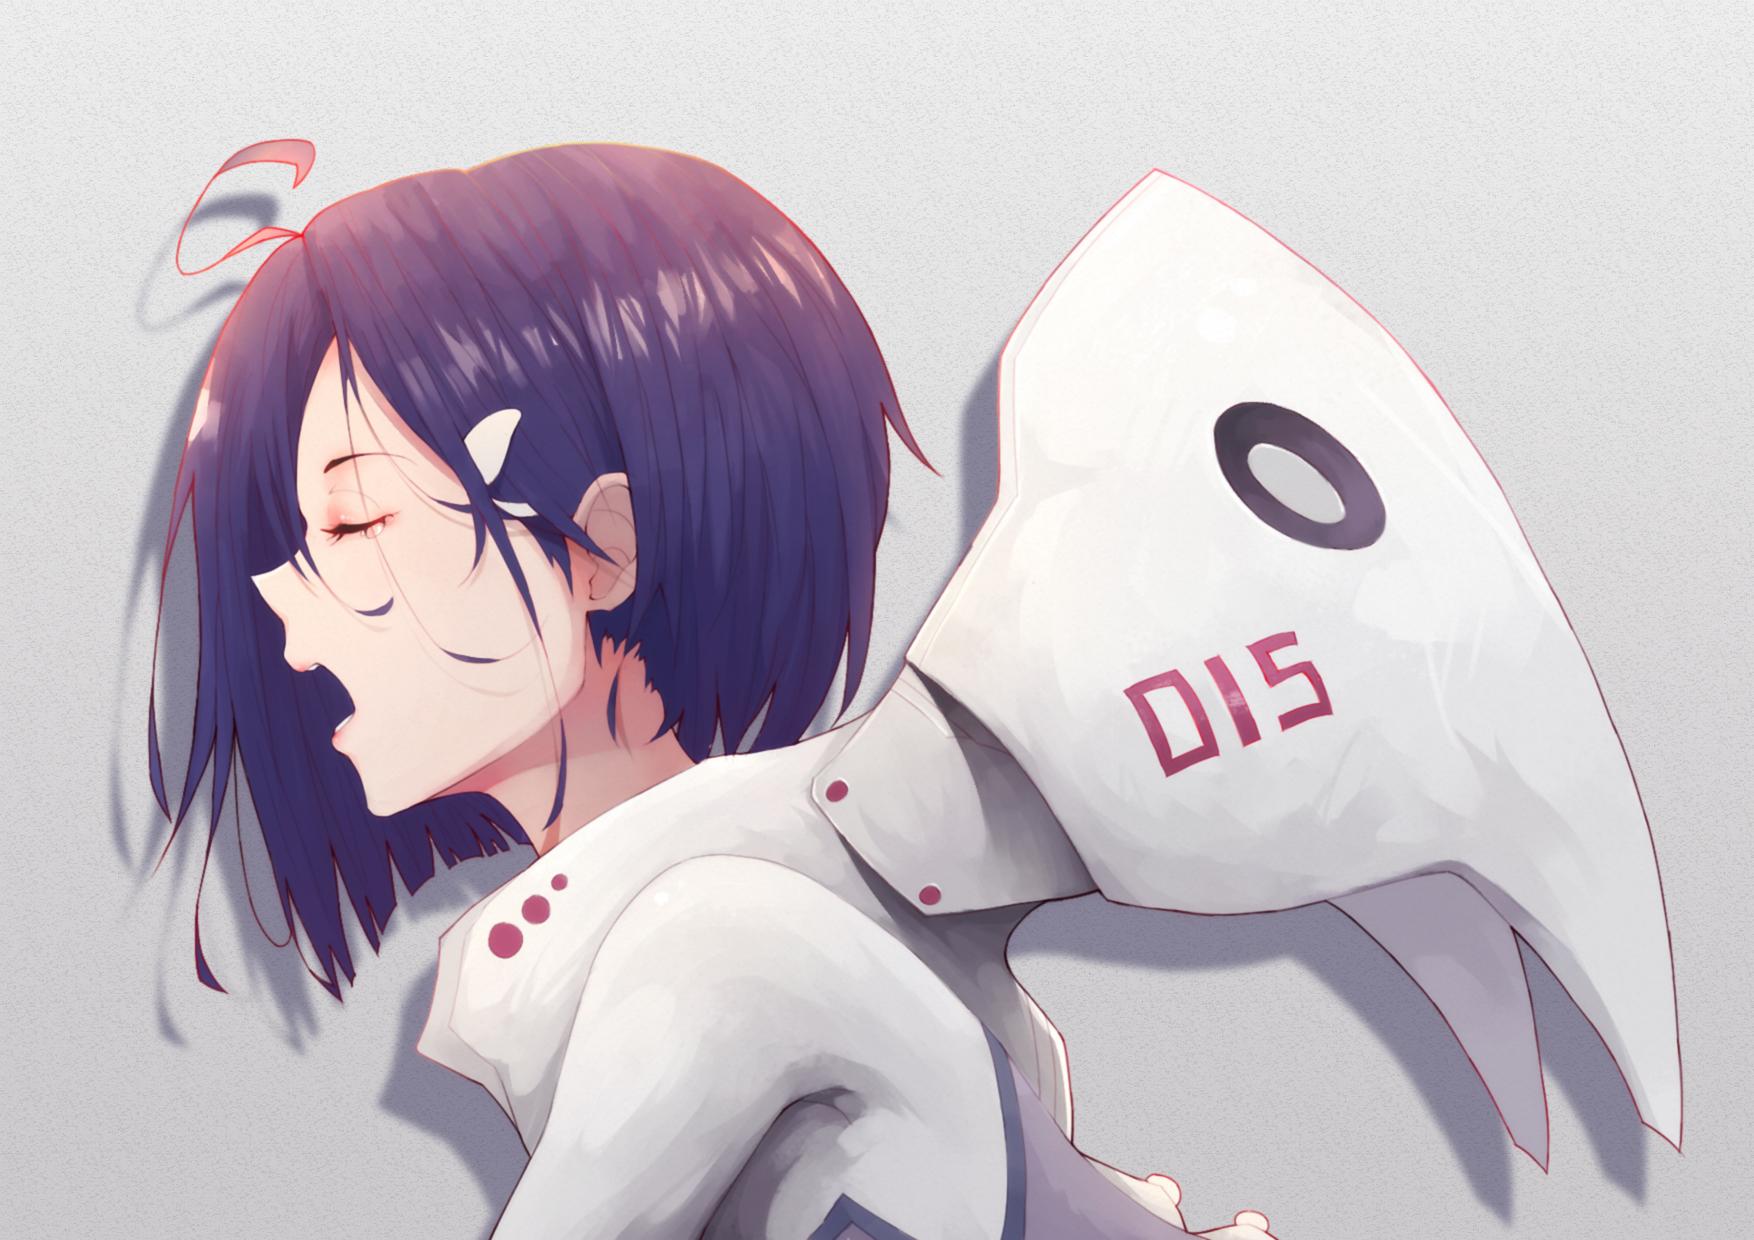 Wallpaper Ichigo Darling In The Franxx Anime Girls Darling In